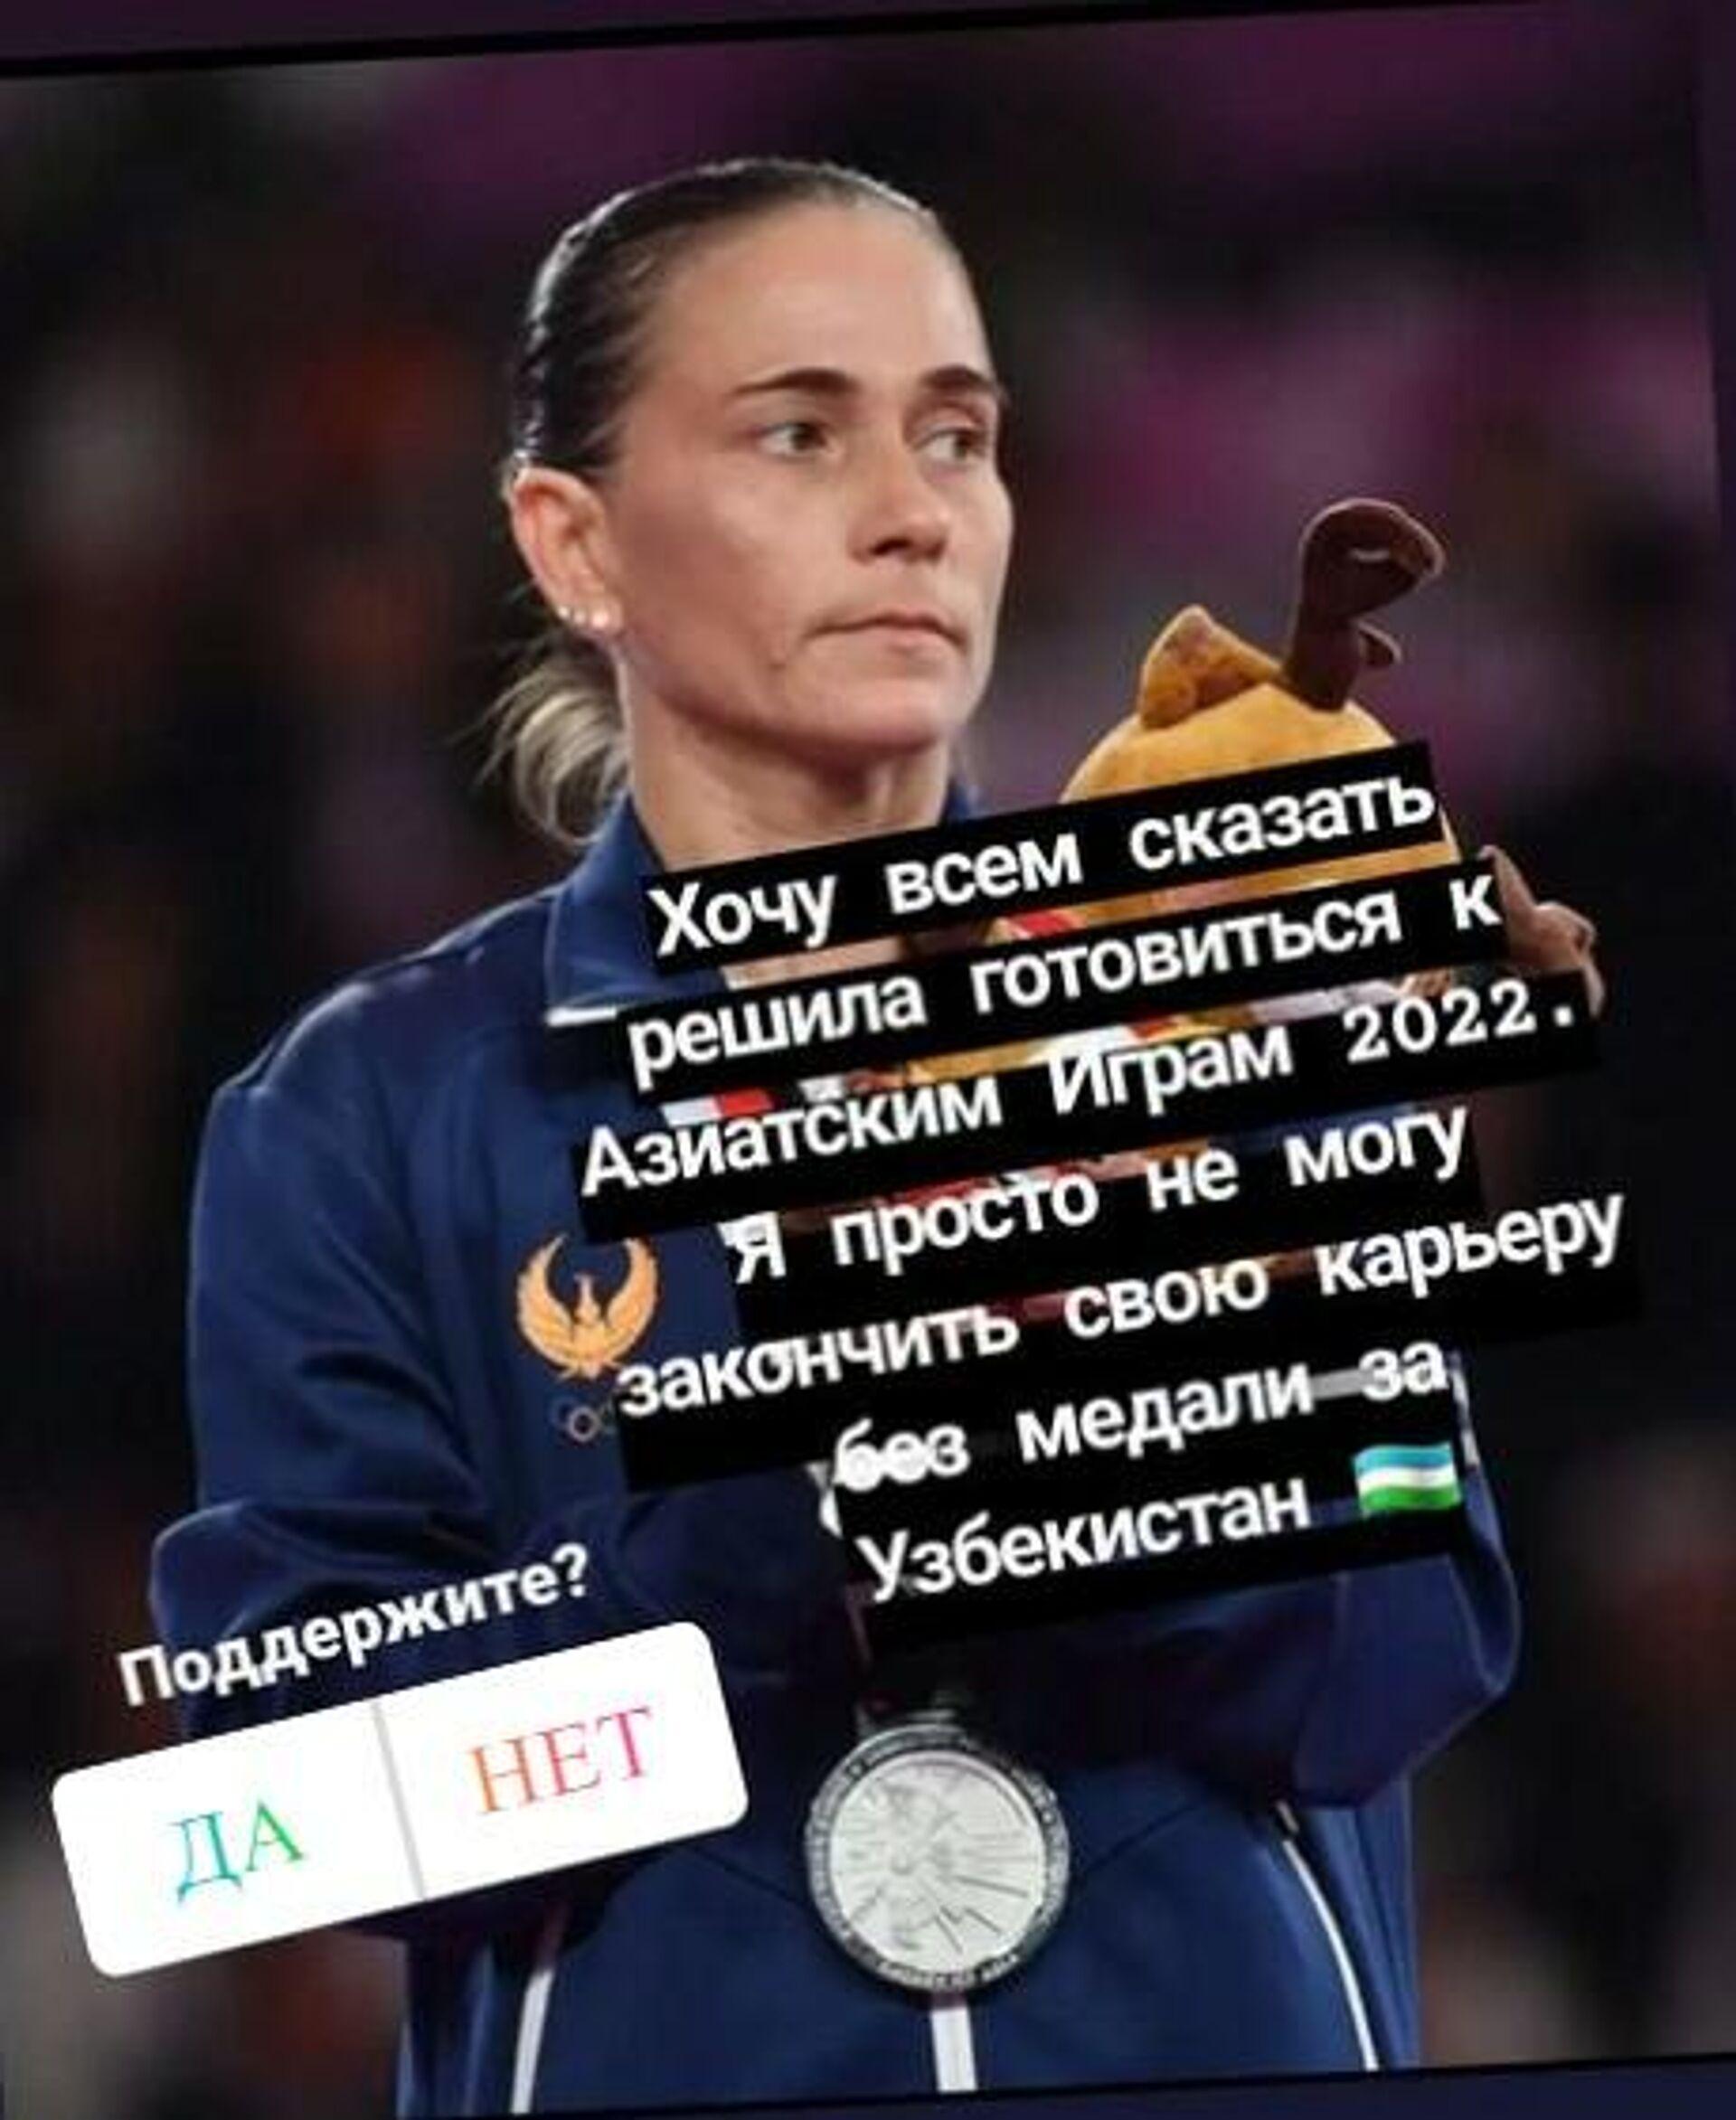 Оксана Чусовитина возвращается в большой спорт - Sputnik Узбекистан, 1920, 01.10.2021